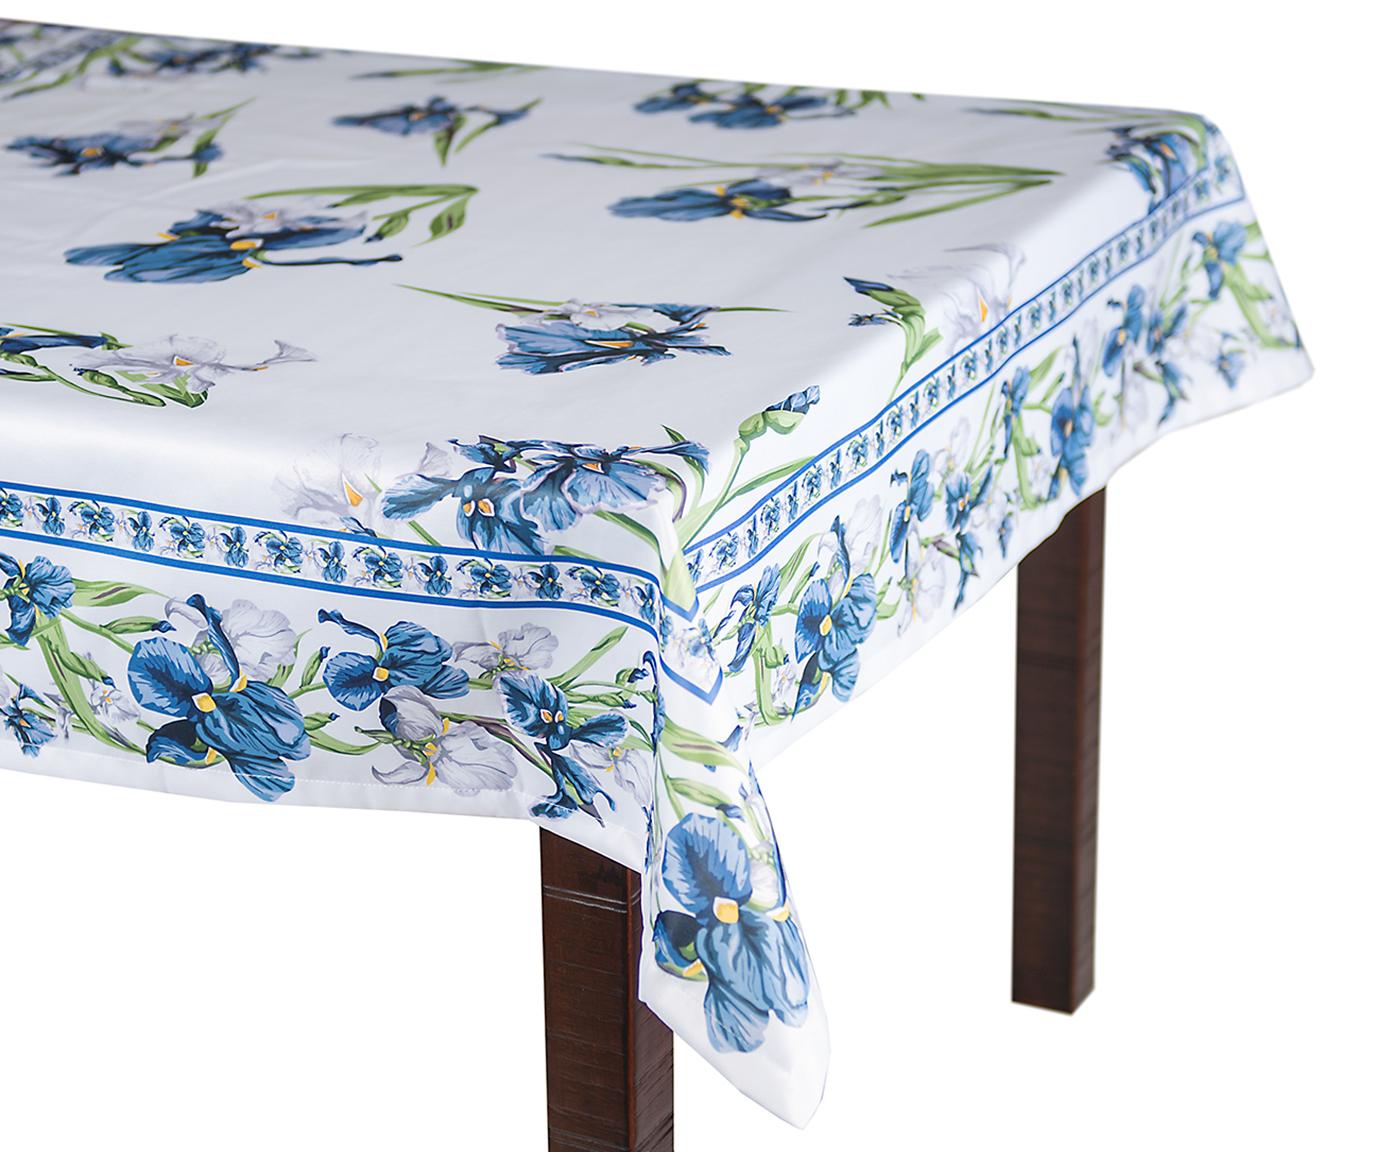 Кухня Скатерть 140x140 Blonder Home Iris синяя skatert-140x140-blonder-home-iris-sinyaya-ssha-rossiya.jpg